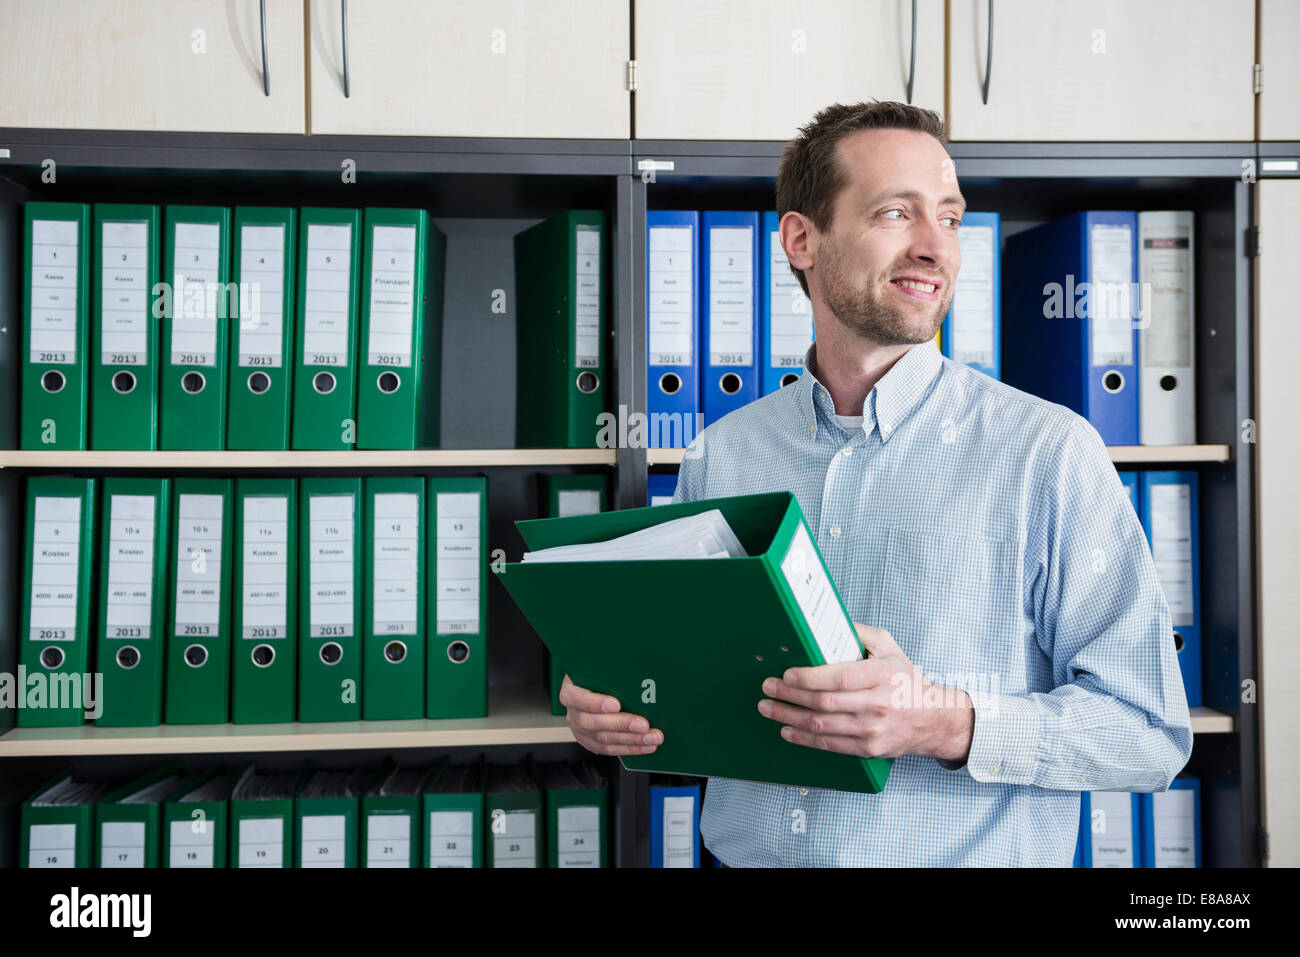 Man office sorting filing cabinet organizing - Stock Image